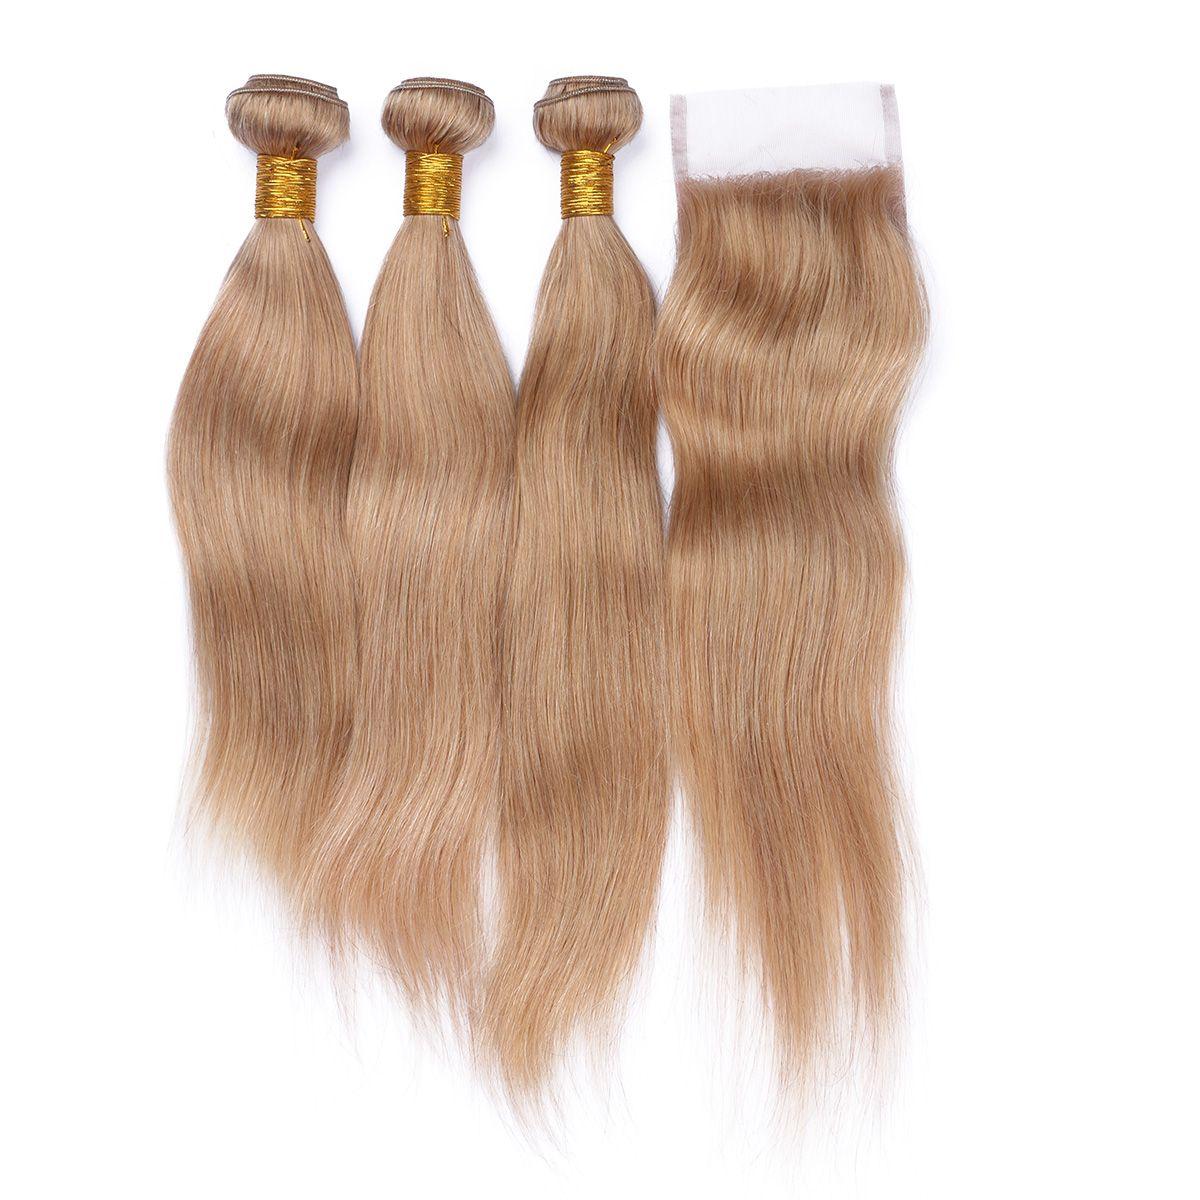 #27 Blonde Malaysian Hair 3Bundles With Top Closure 4Pcs Lot Honey Blonde Straight Human Hair With 4*4 Lace Closure 4Pcs Lot